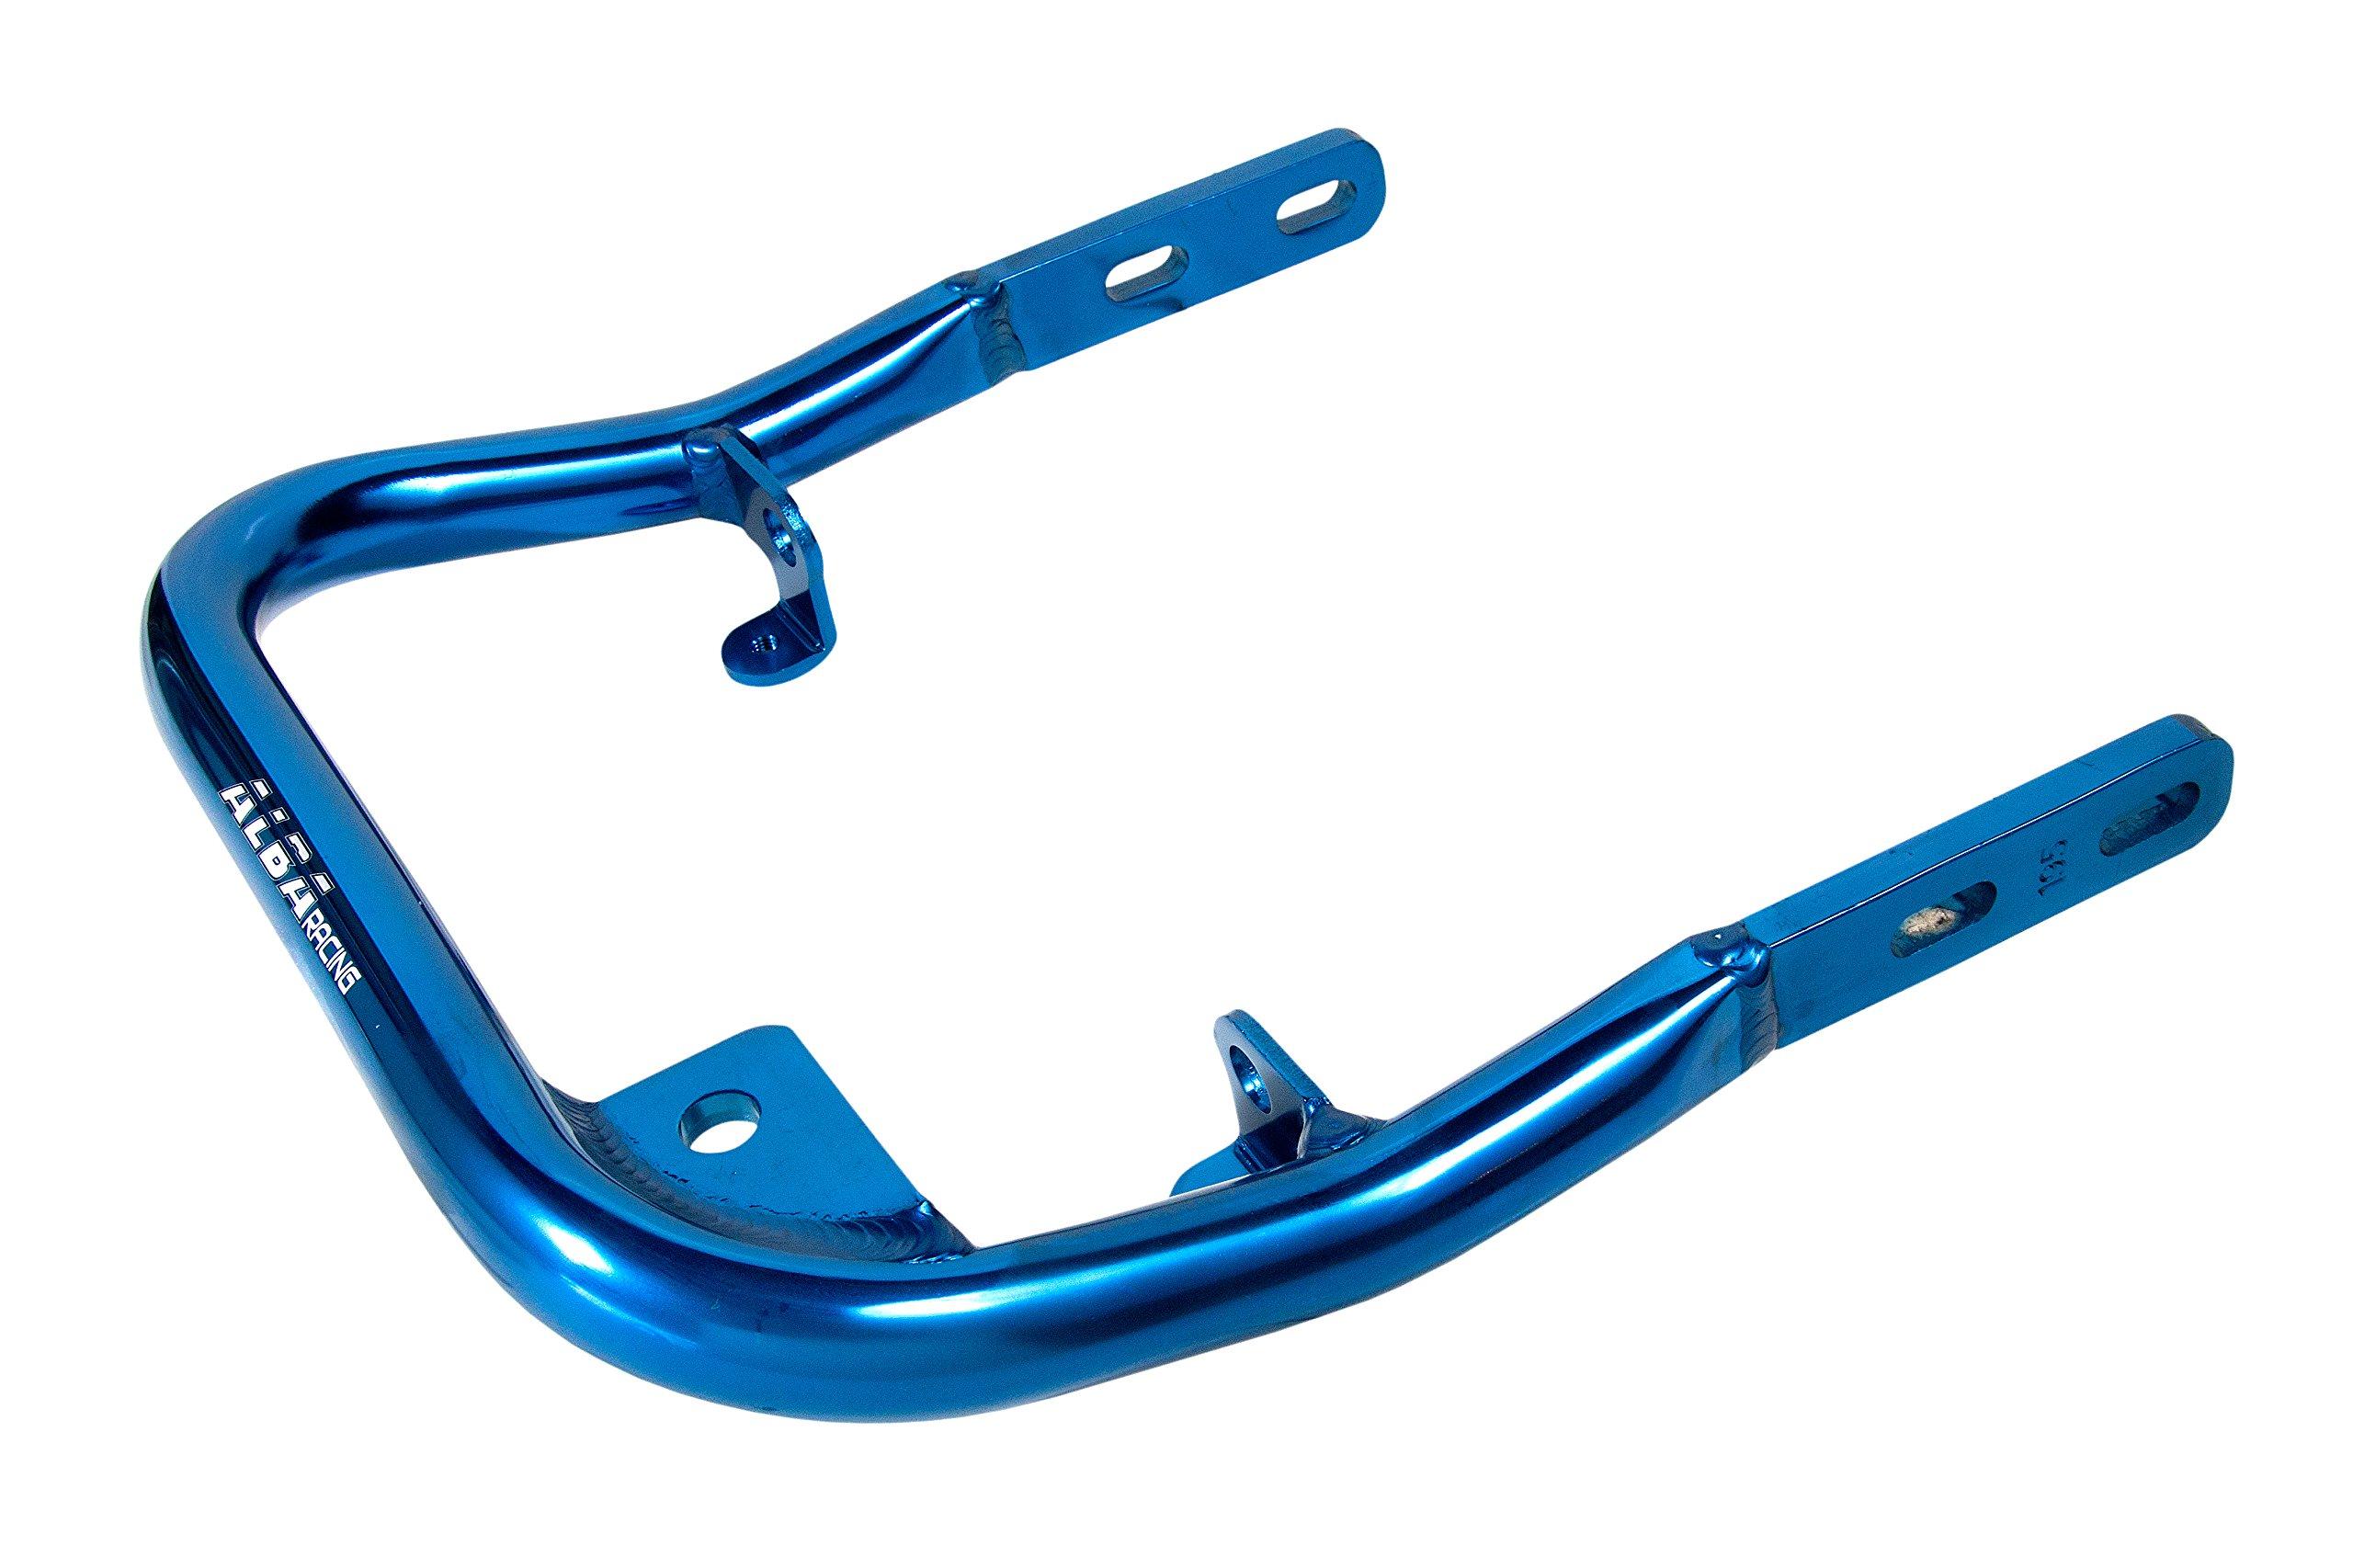 Suzuki LTR 450 (2006-2009) ATV Rear Grab Bar Bumper Blue